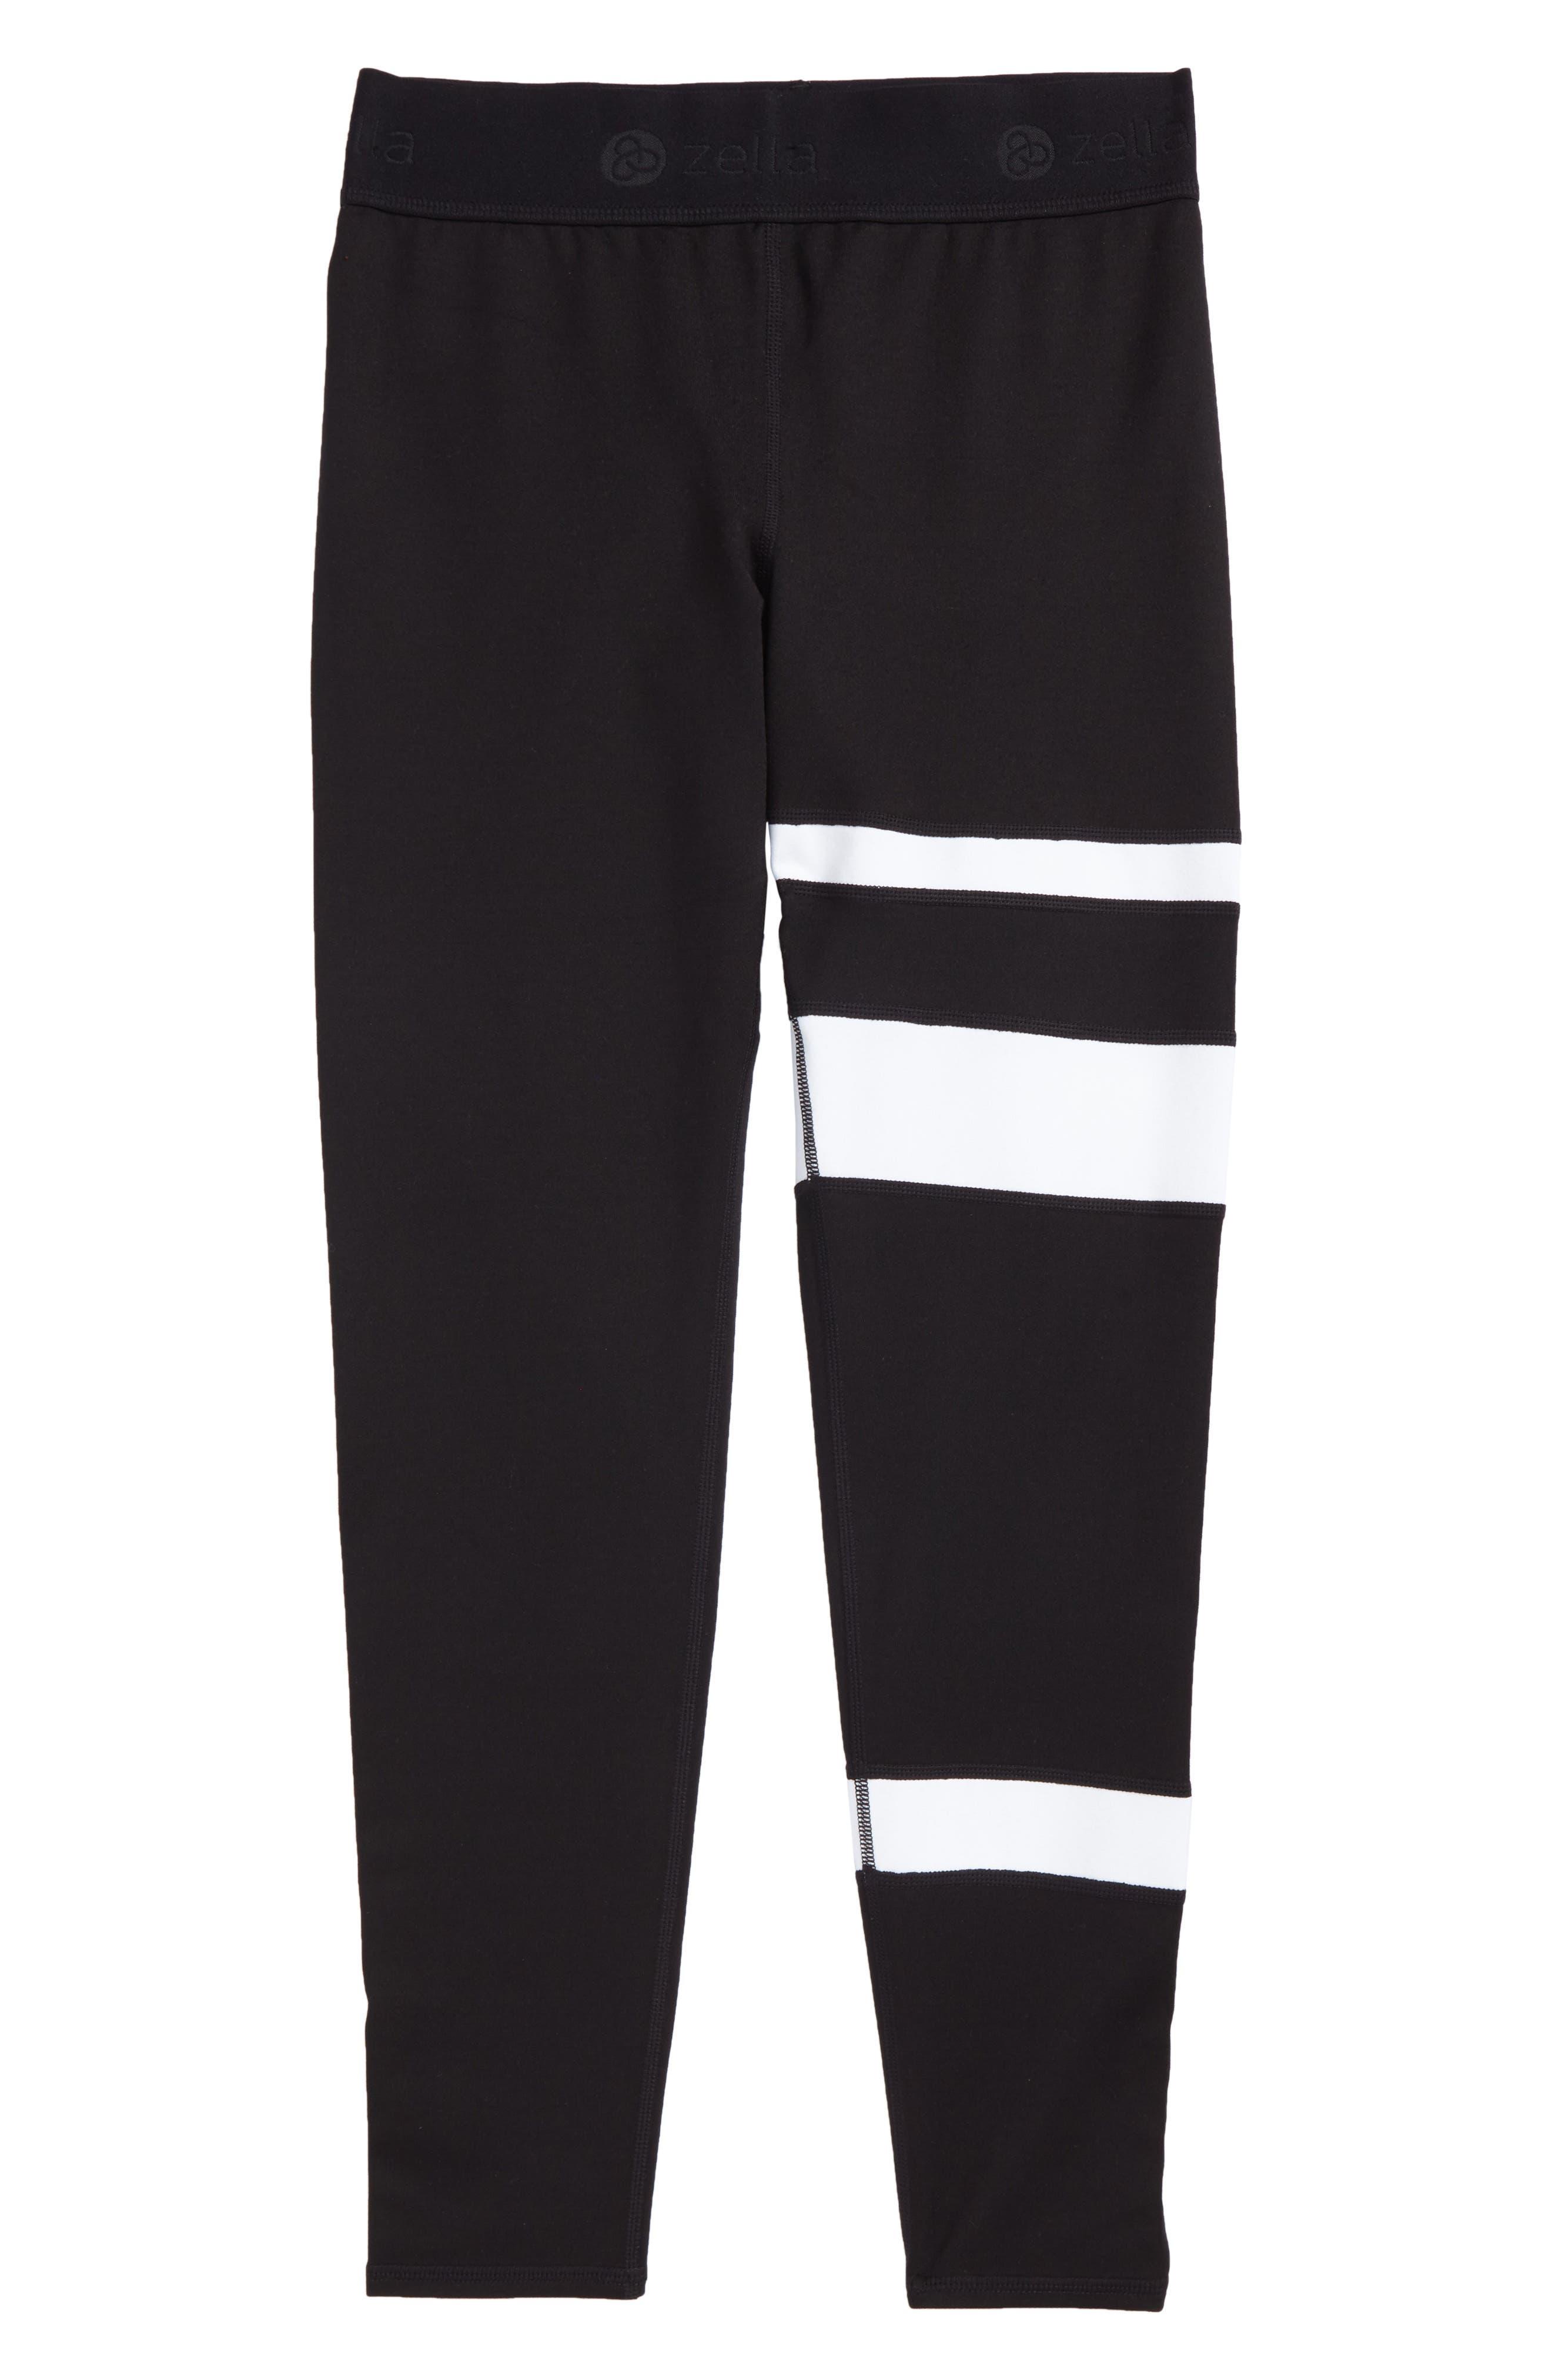 Zella Stripe Leggings,                         Main,                         color, Black- White Stripes